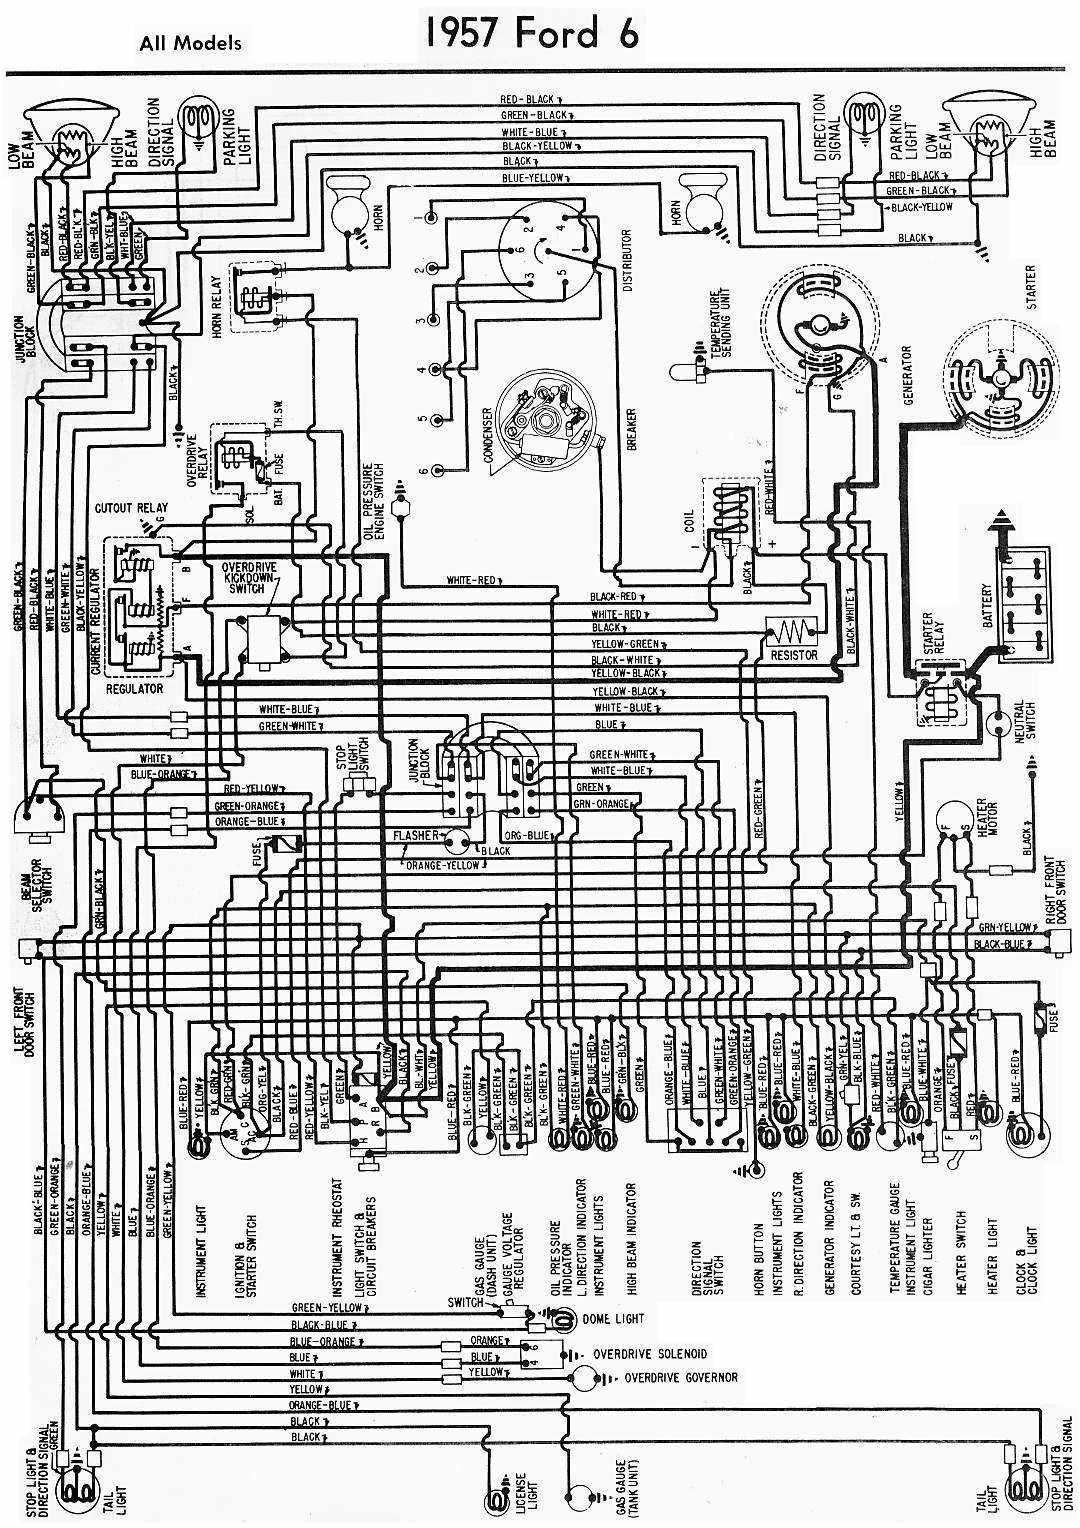 Free Ford Wiring Diagrams Beretta 92fs Parts Diagram 1957 Ranchero Get Image